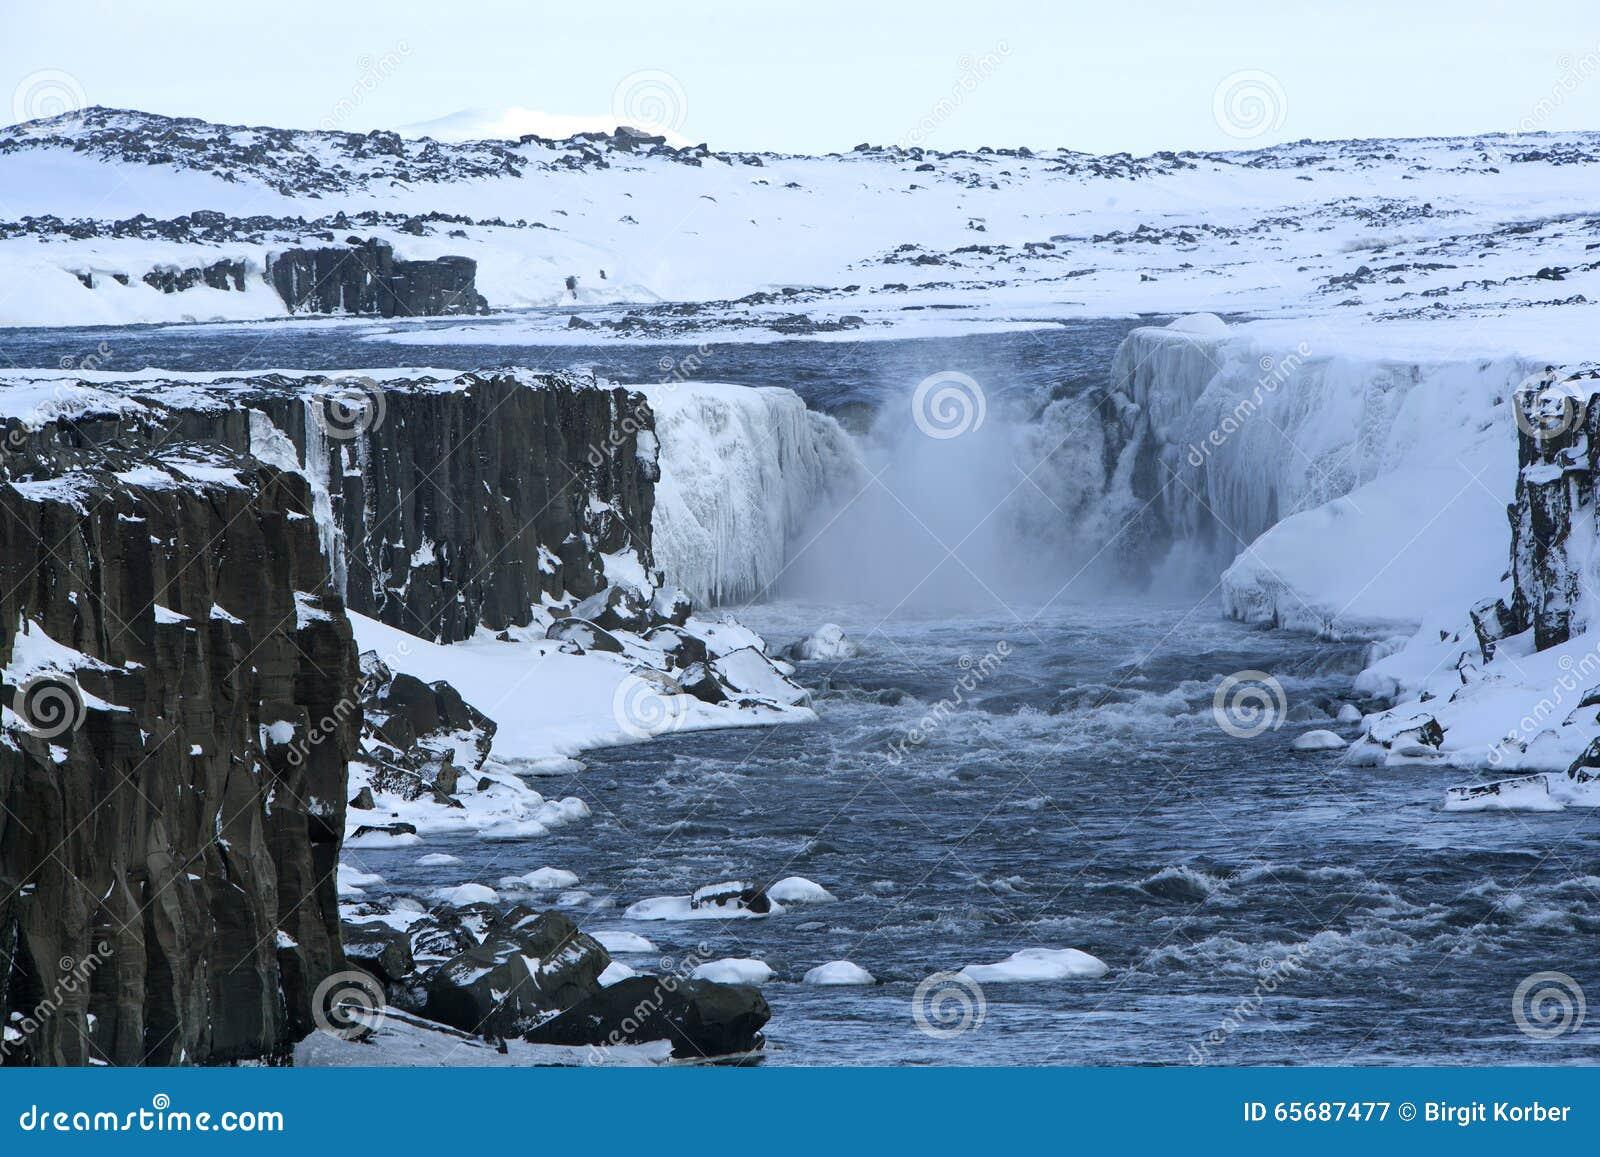 selfoss women Iceland becoming an outdoors woman outdoor skills adventure kayaking, hiking, waterfalls, horseback riding expert guides no single supplements join us.